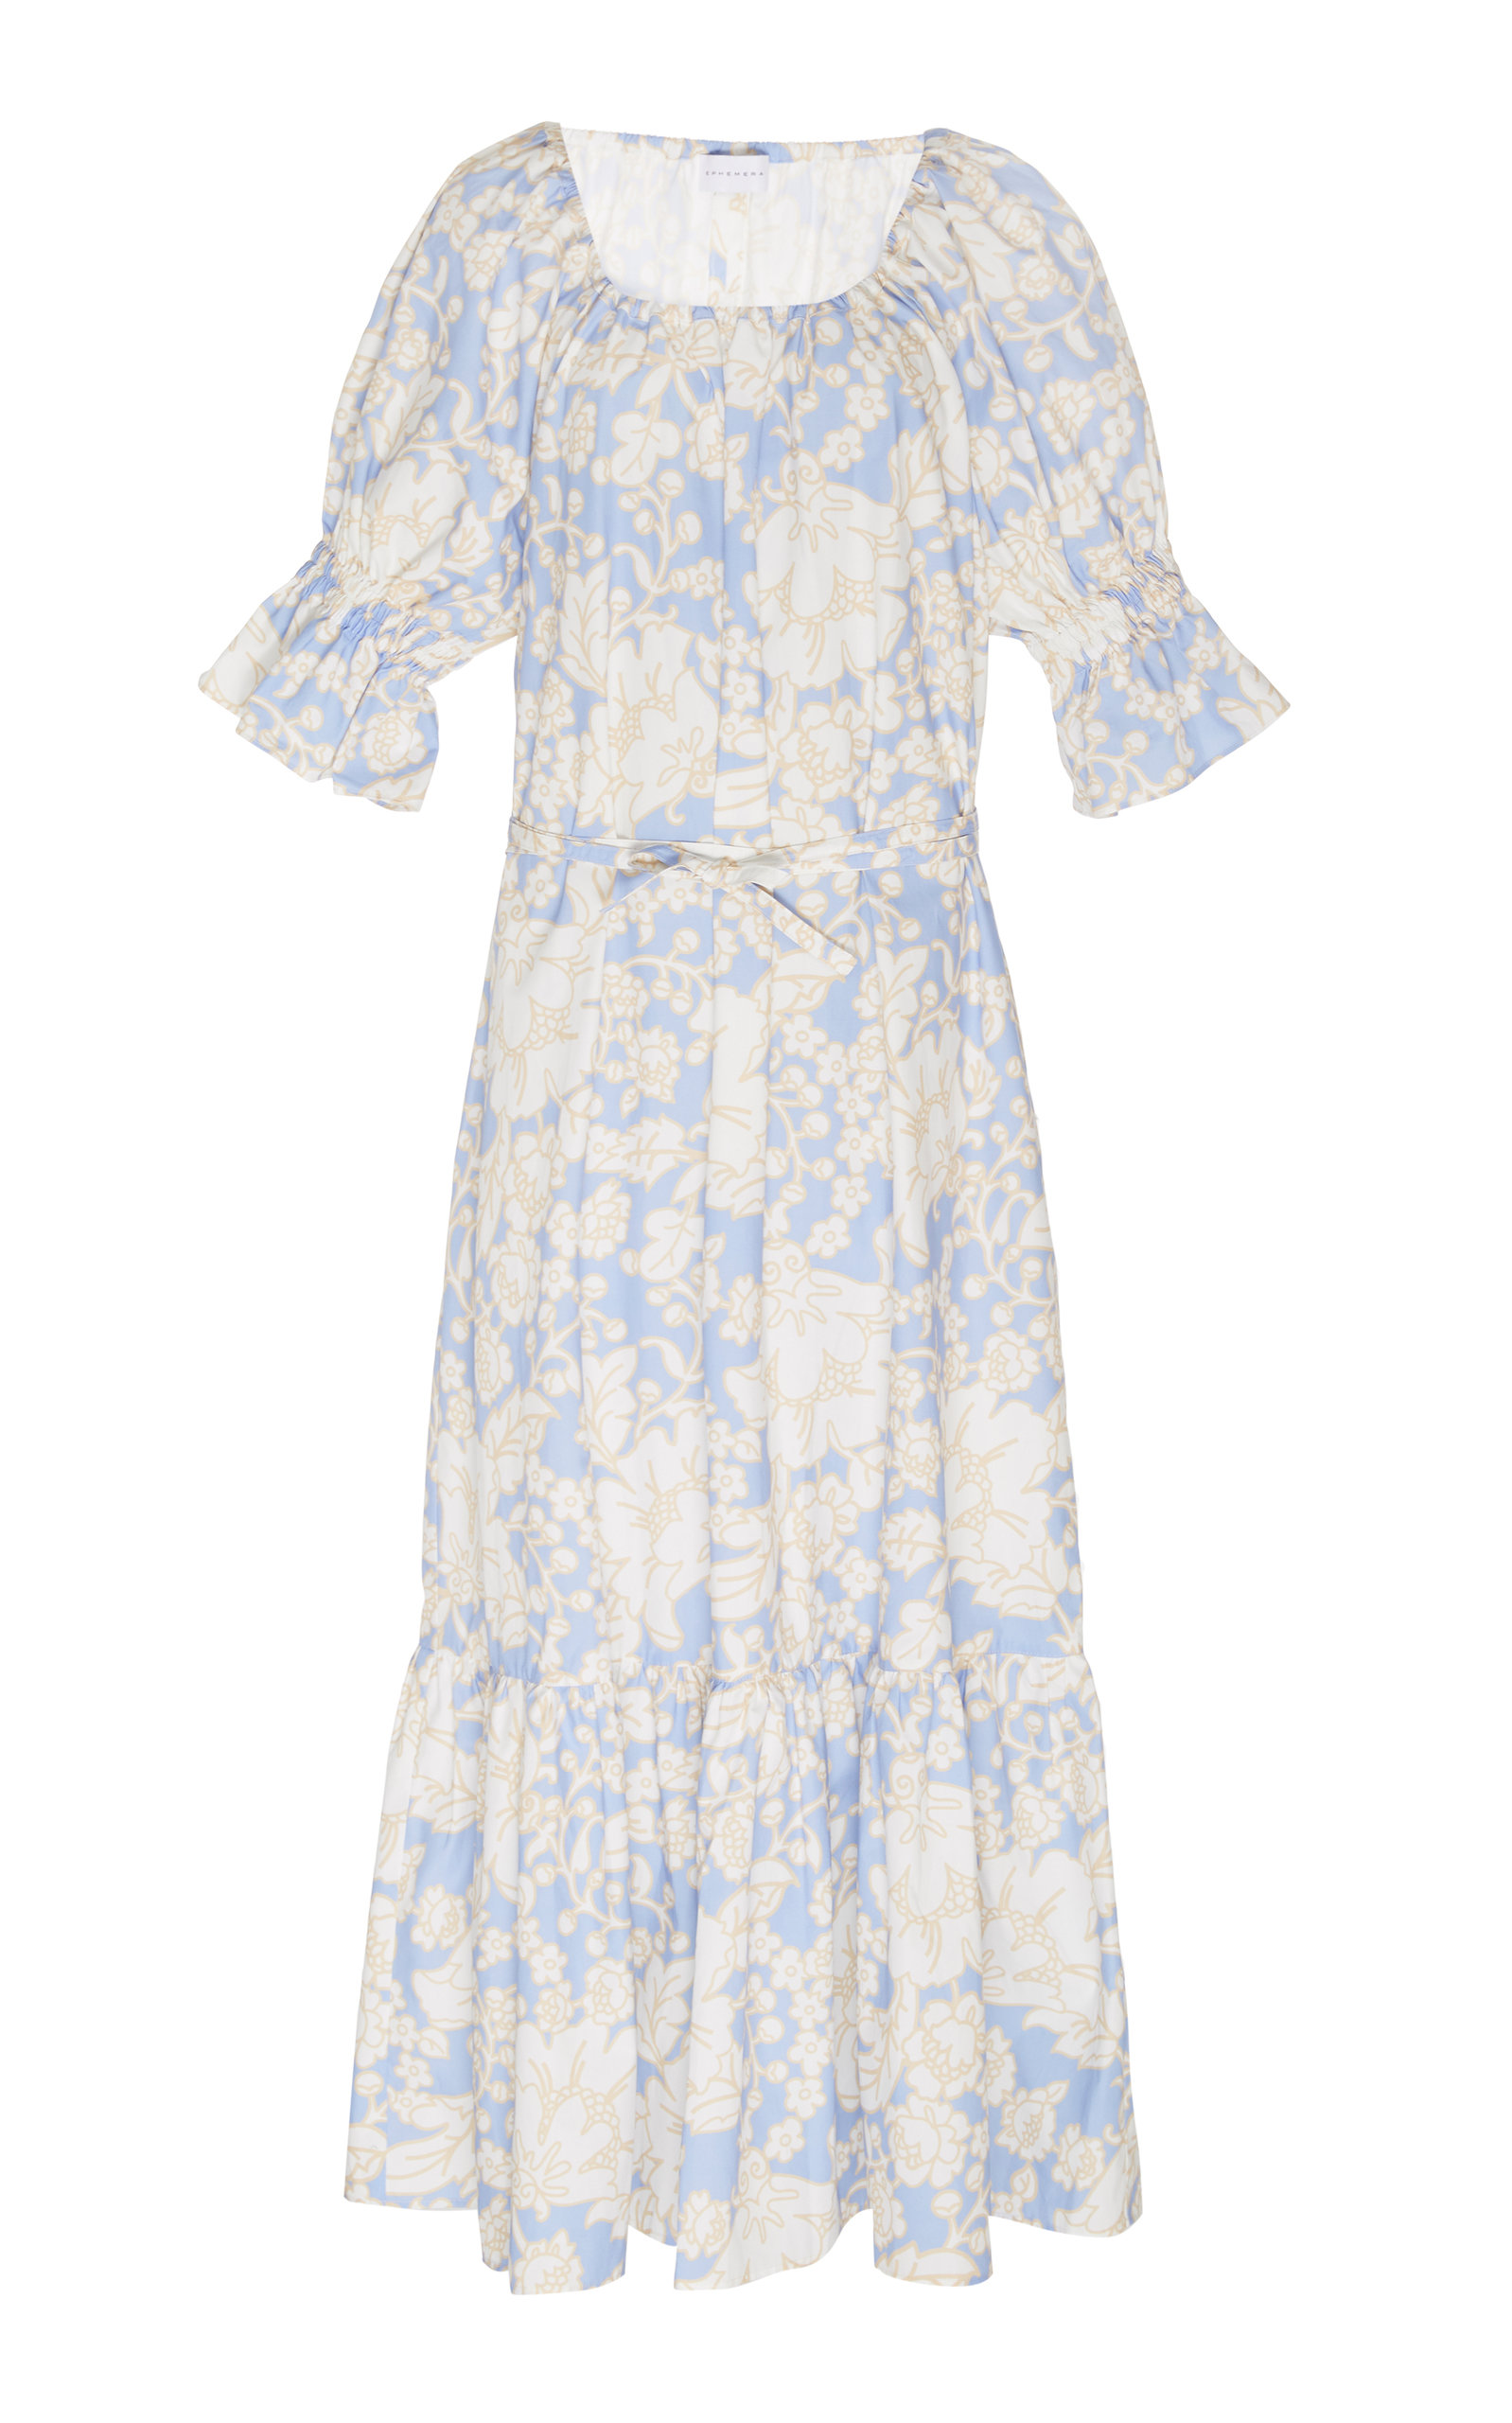 Buy Ephemera Zeppelin Floral-Print Cotton Maxi Dress online, shop Ephemera at the best price